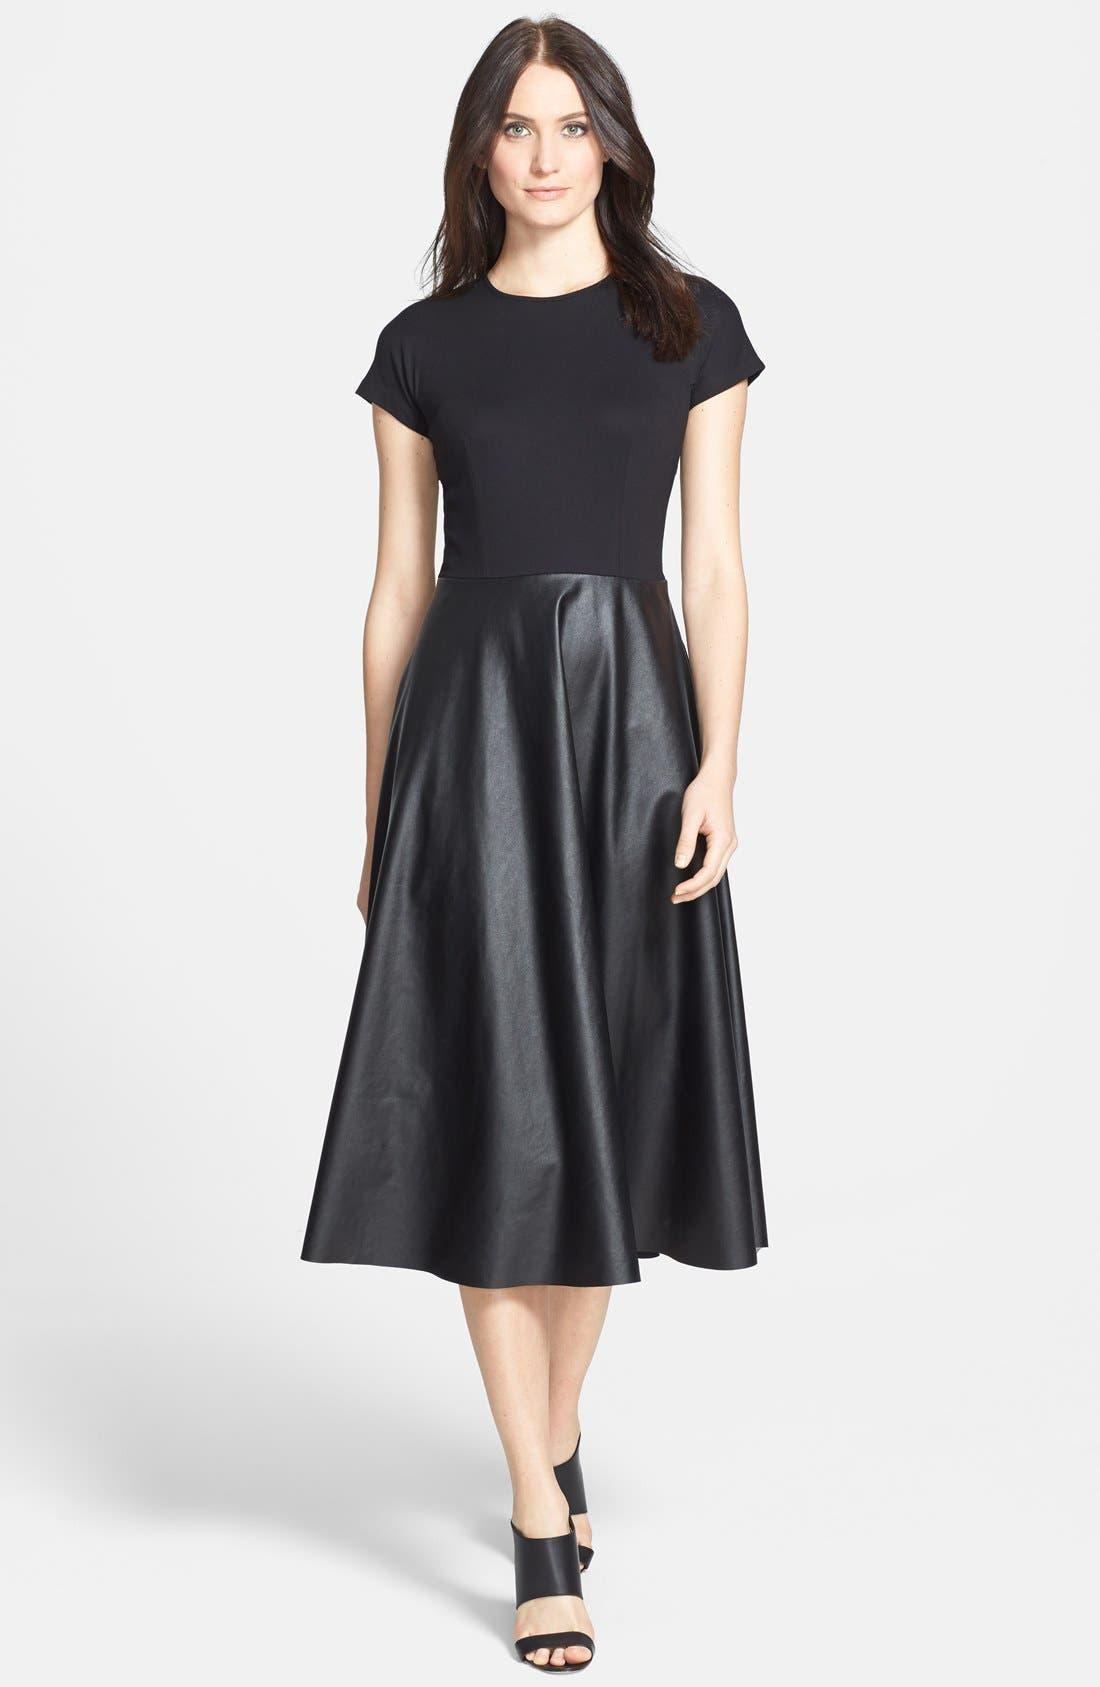 Alternate Image 1 Selected - Lafayette 148 New York 'Mirna - Neo Tech' Dress